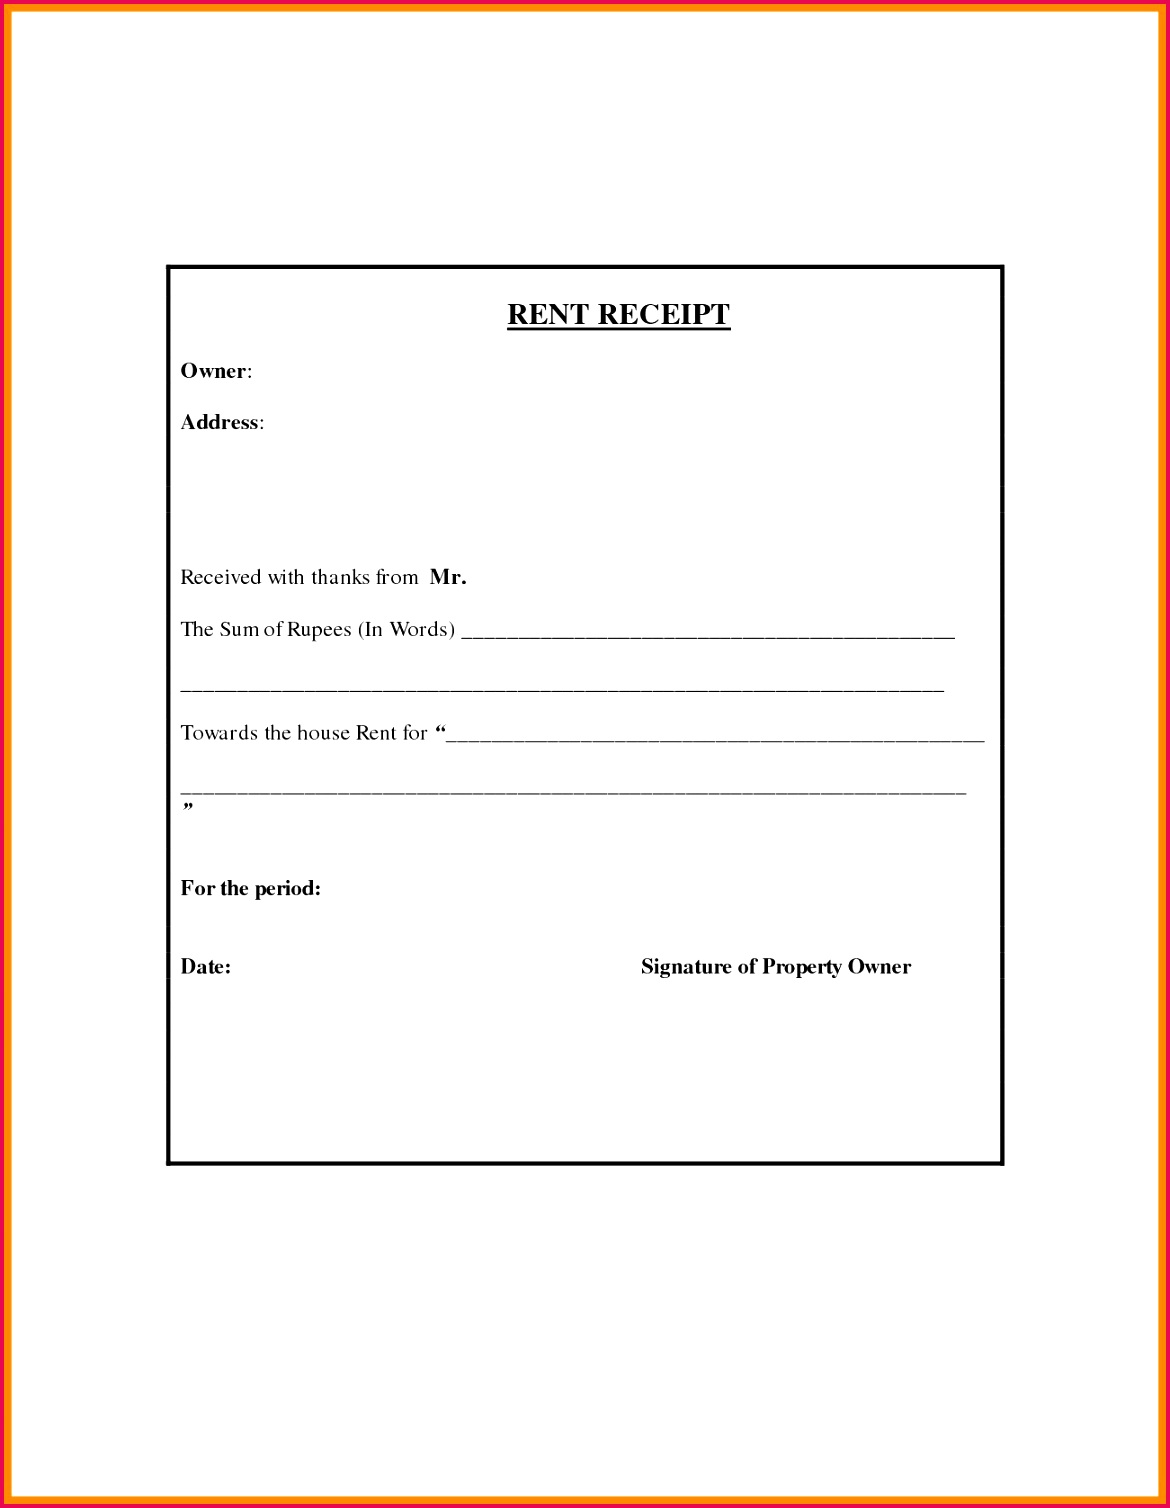 Receipt Ledger Template Helpful Receipts forms Fresh Blank General Ledger Template Receipt Ledger Template Helpful